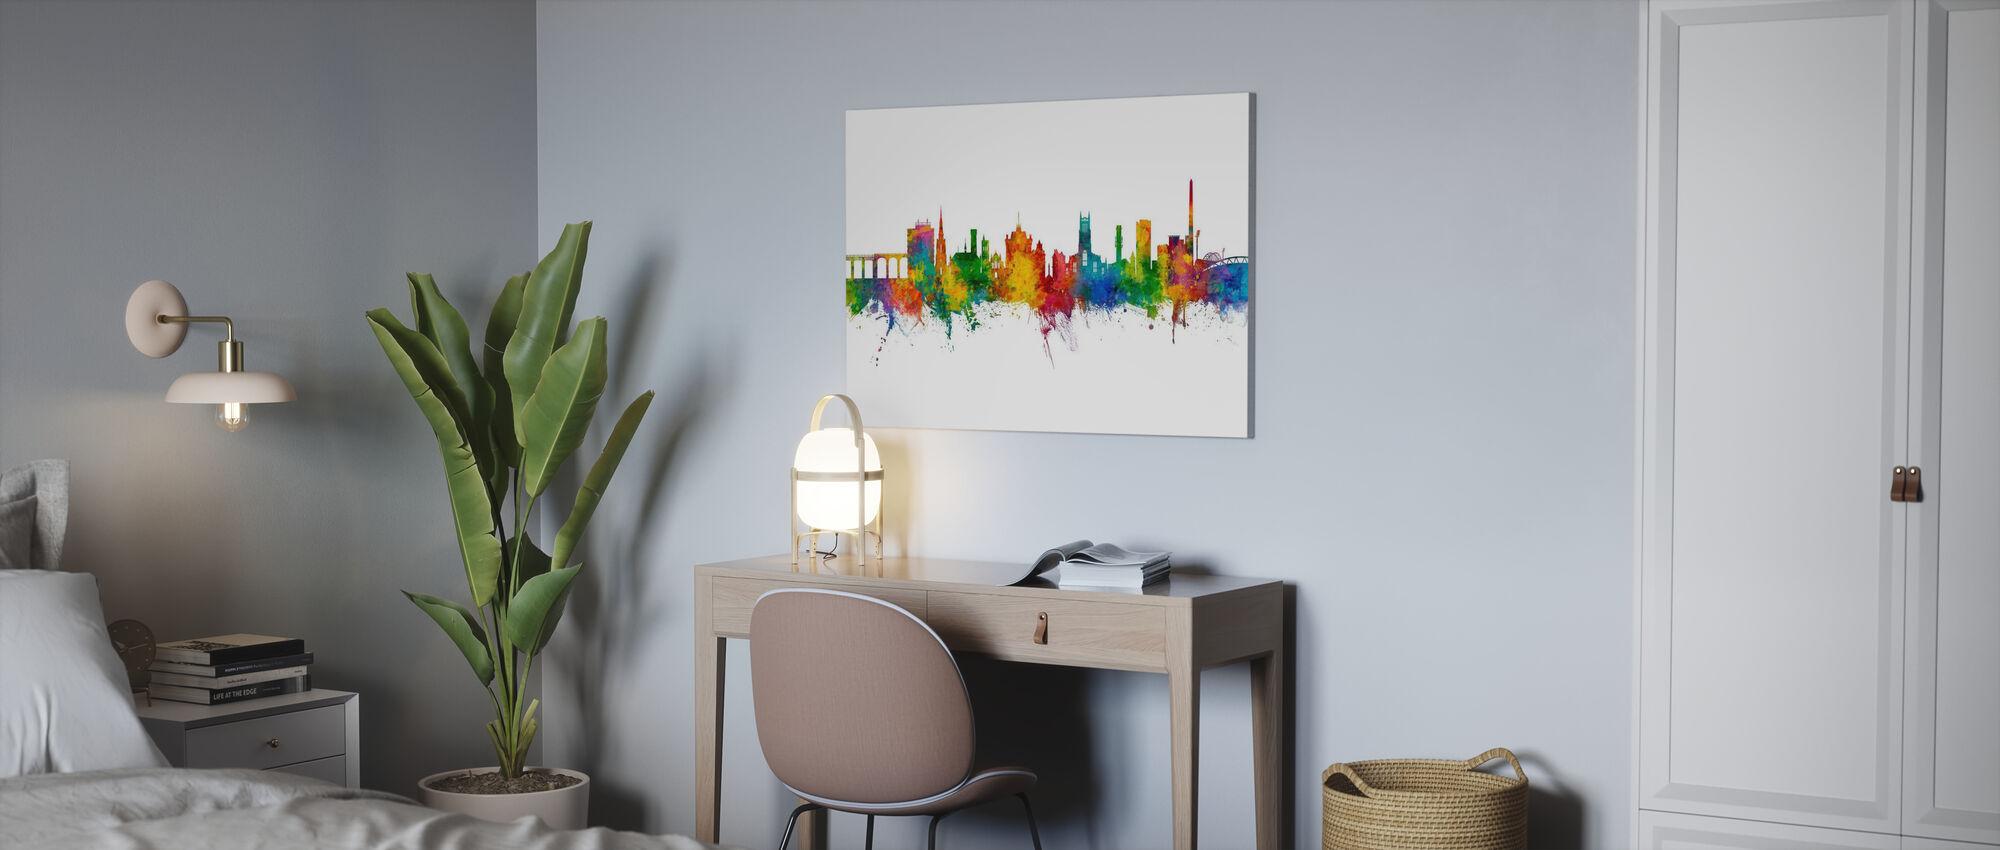 Huddersfield England Skyline - Canvas print - Office